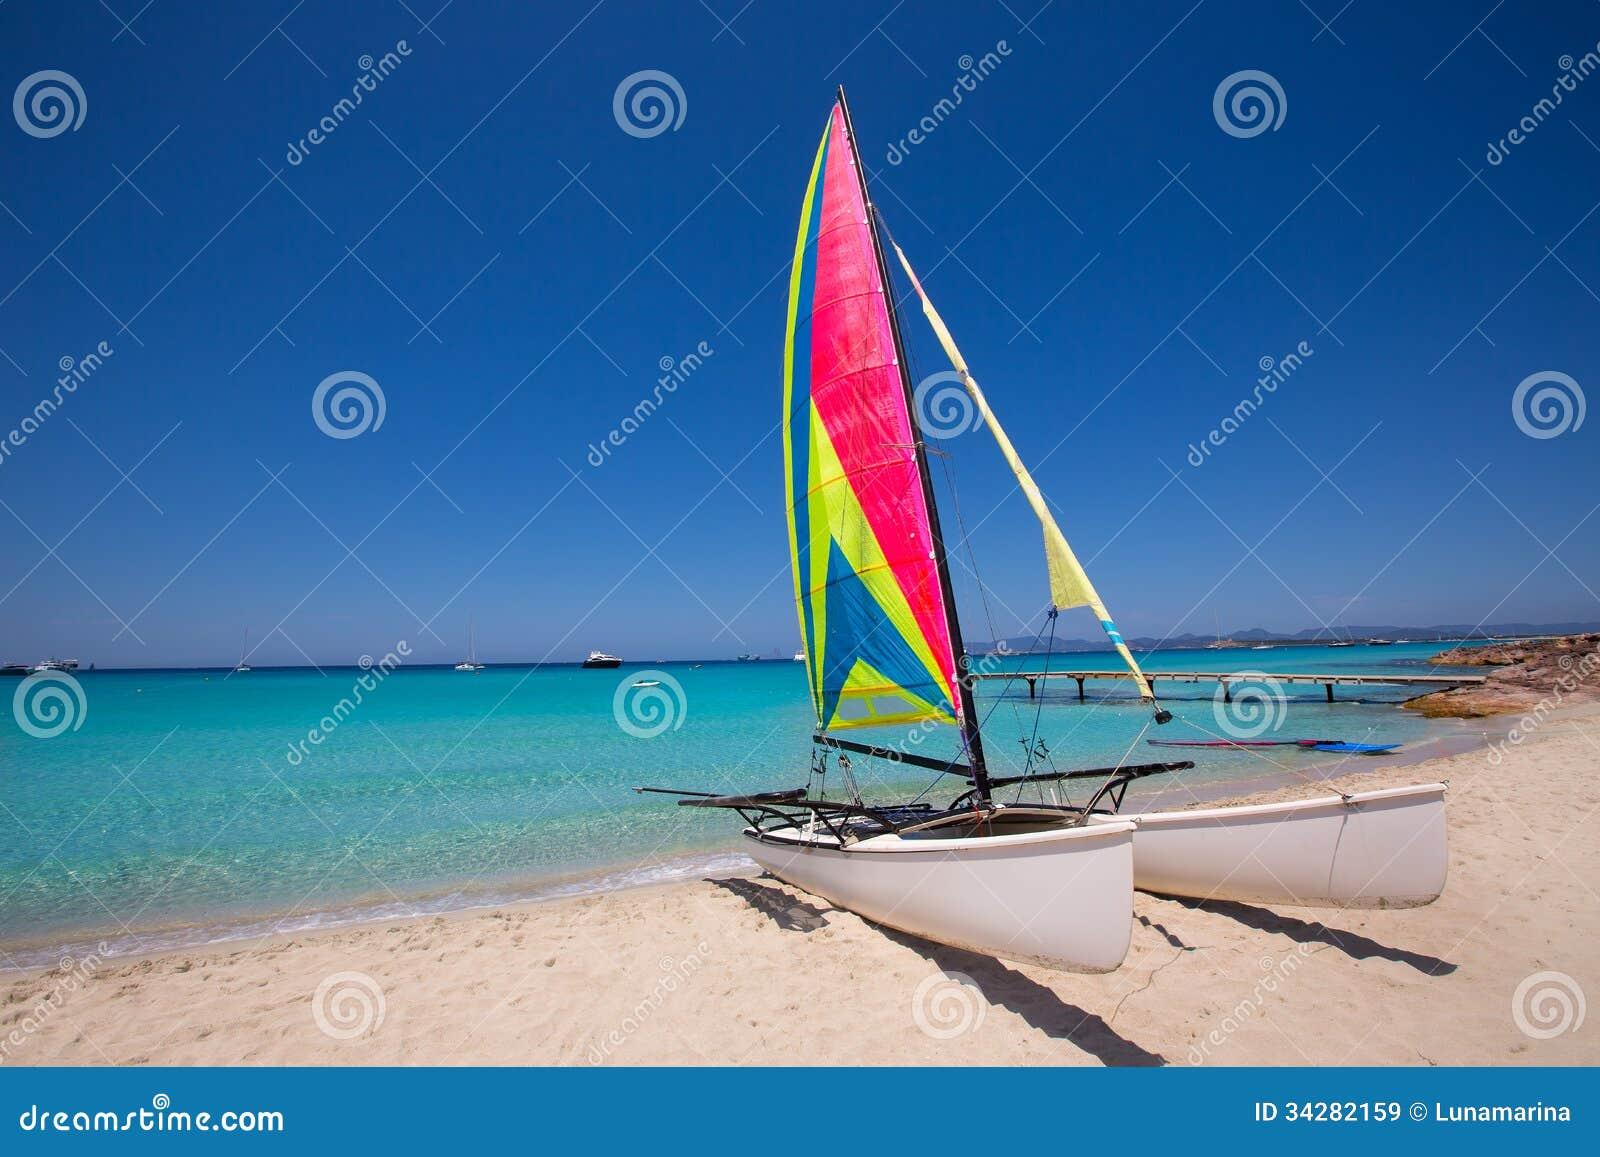 Royalty Free Stock Images: Catamaran sailboat in Illetes beach of ...